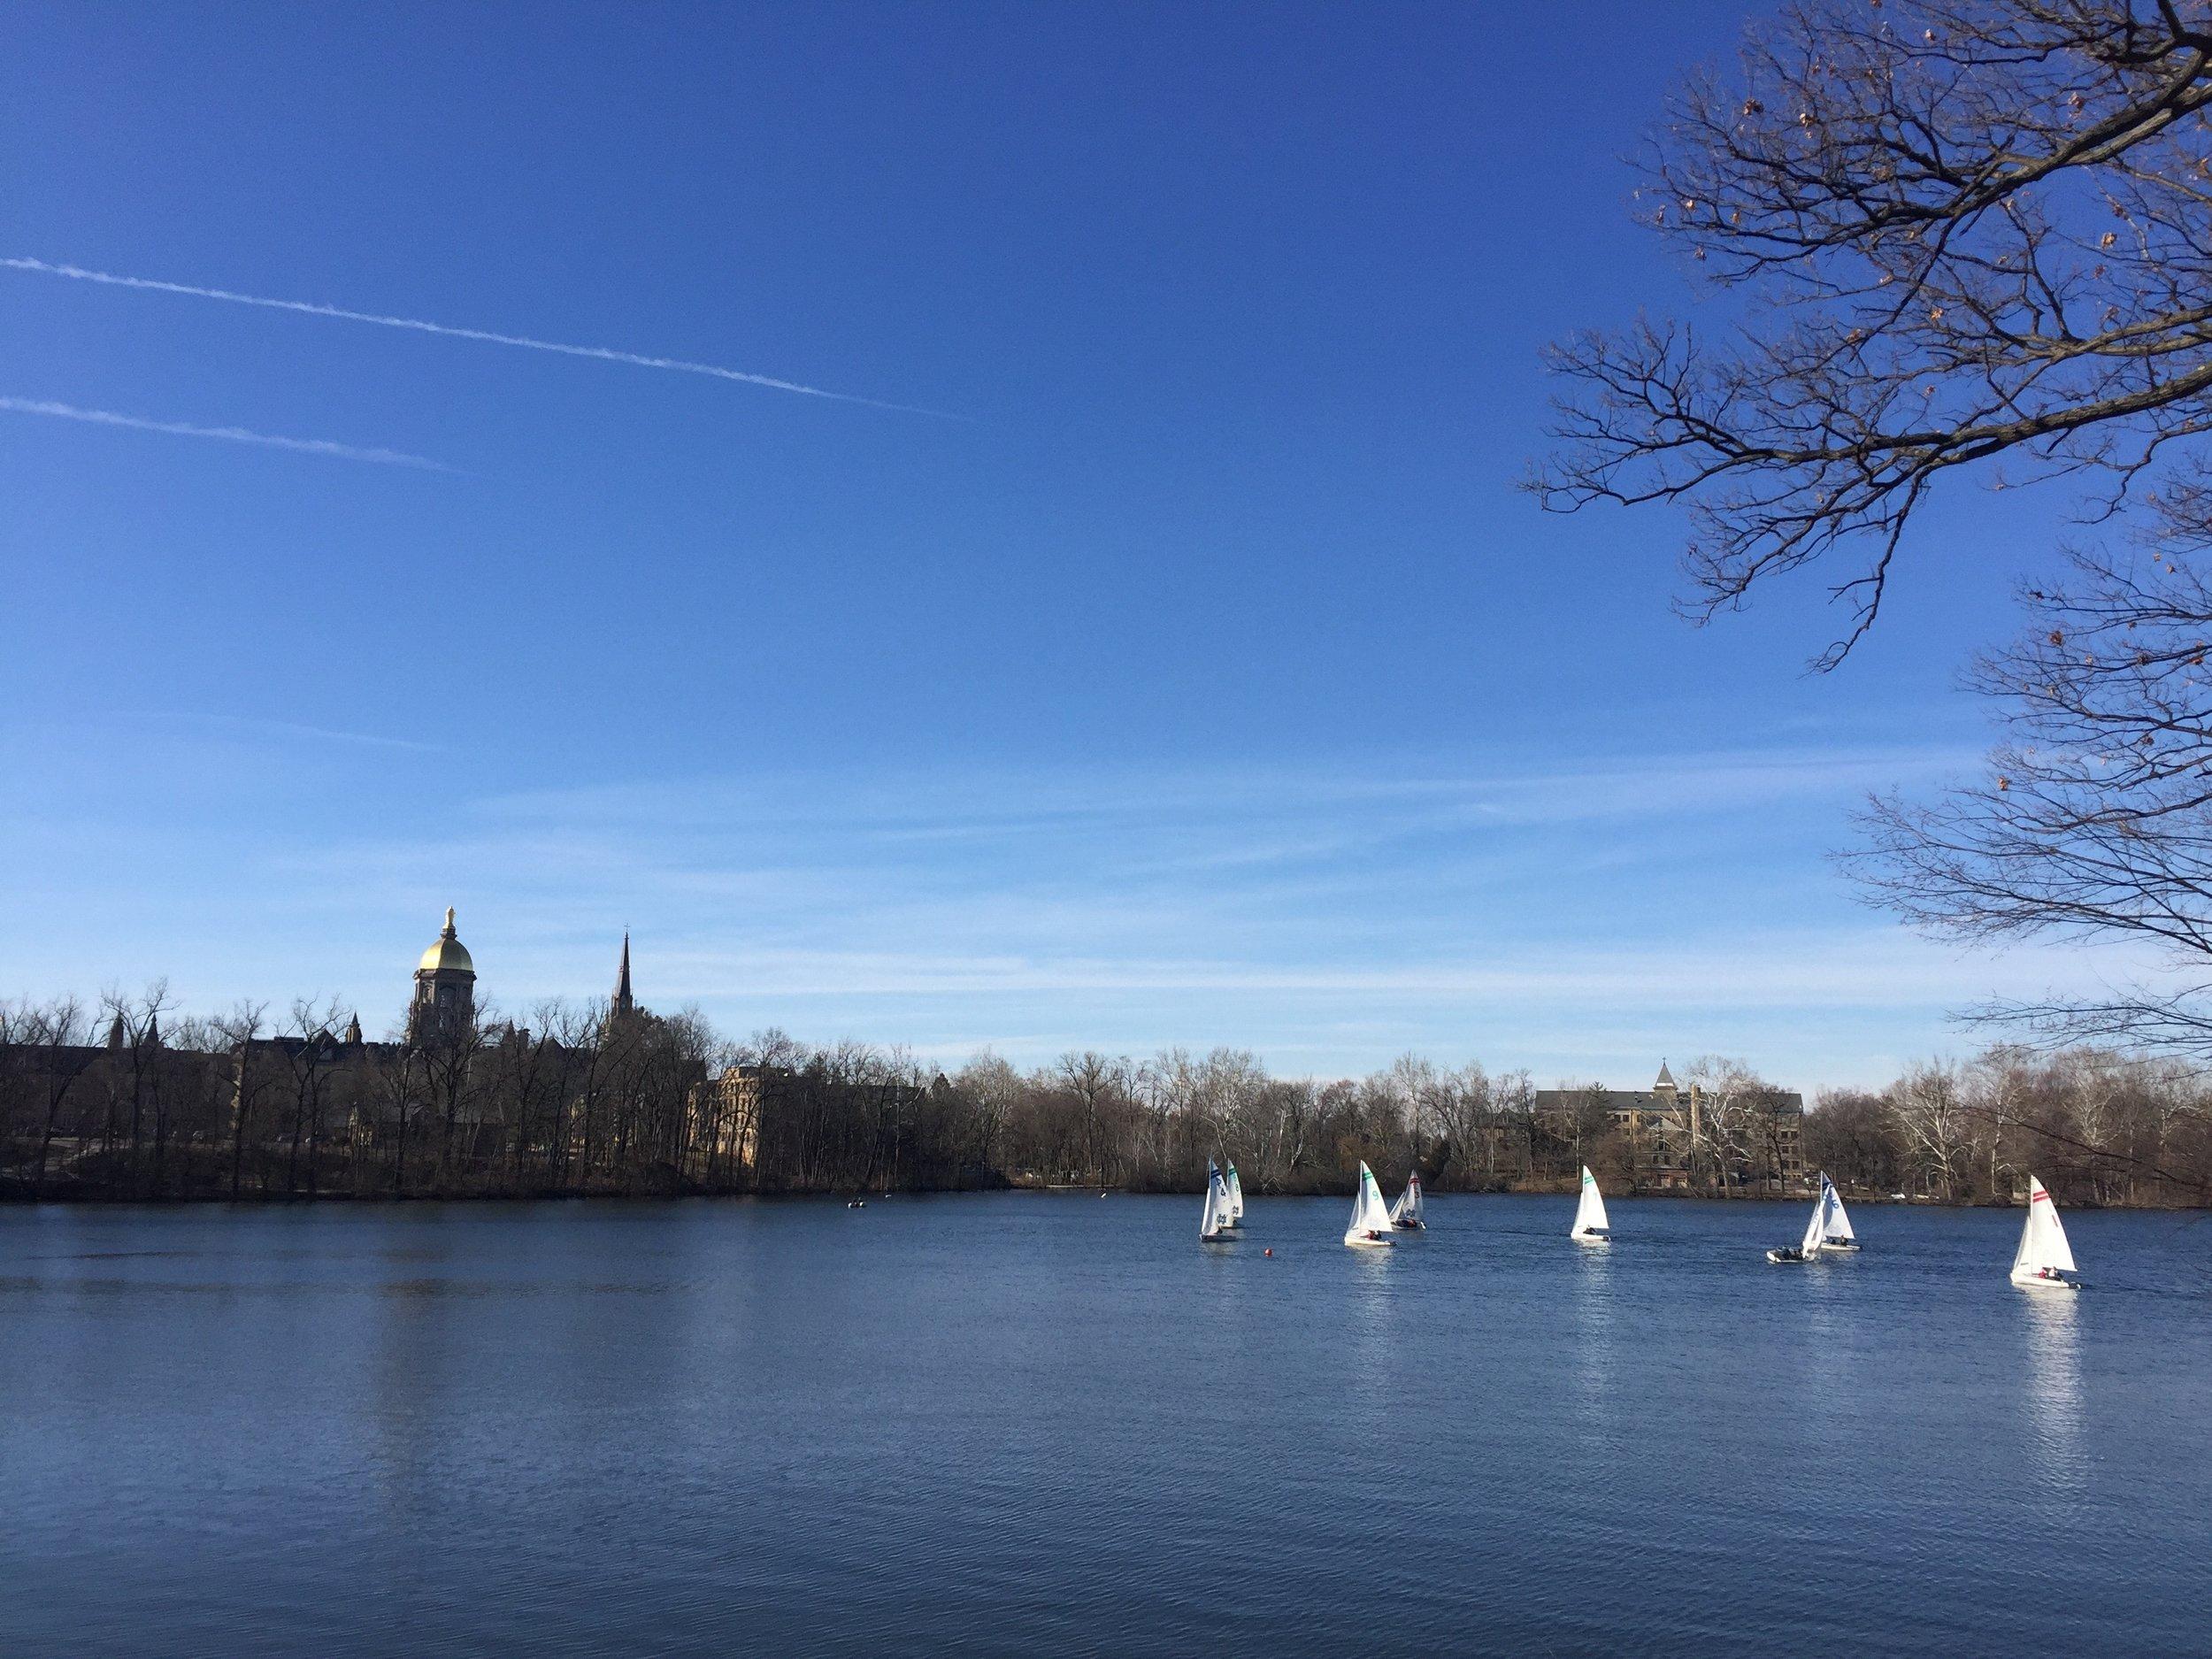 St. Joseph's Lake